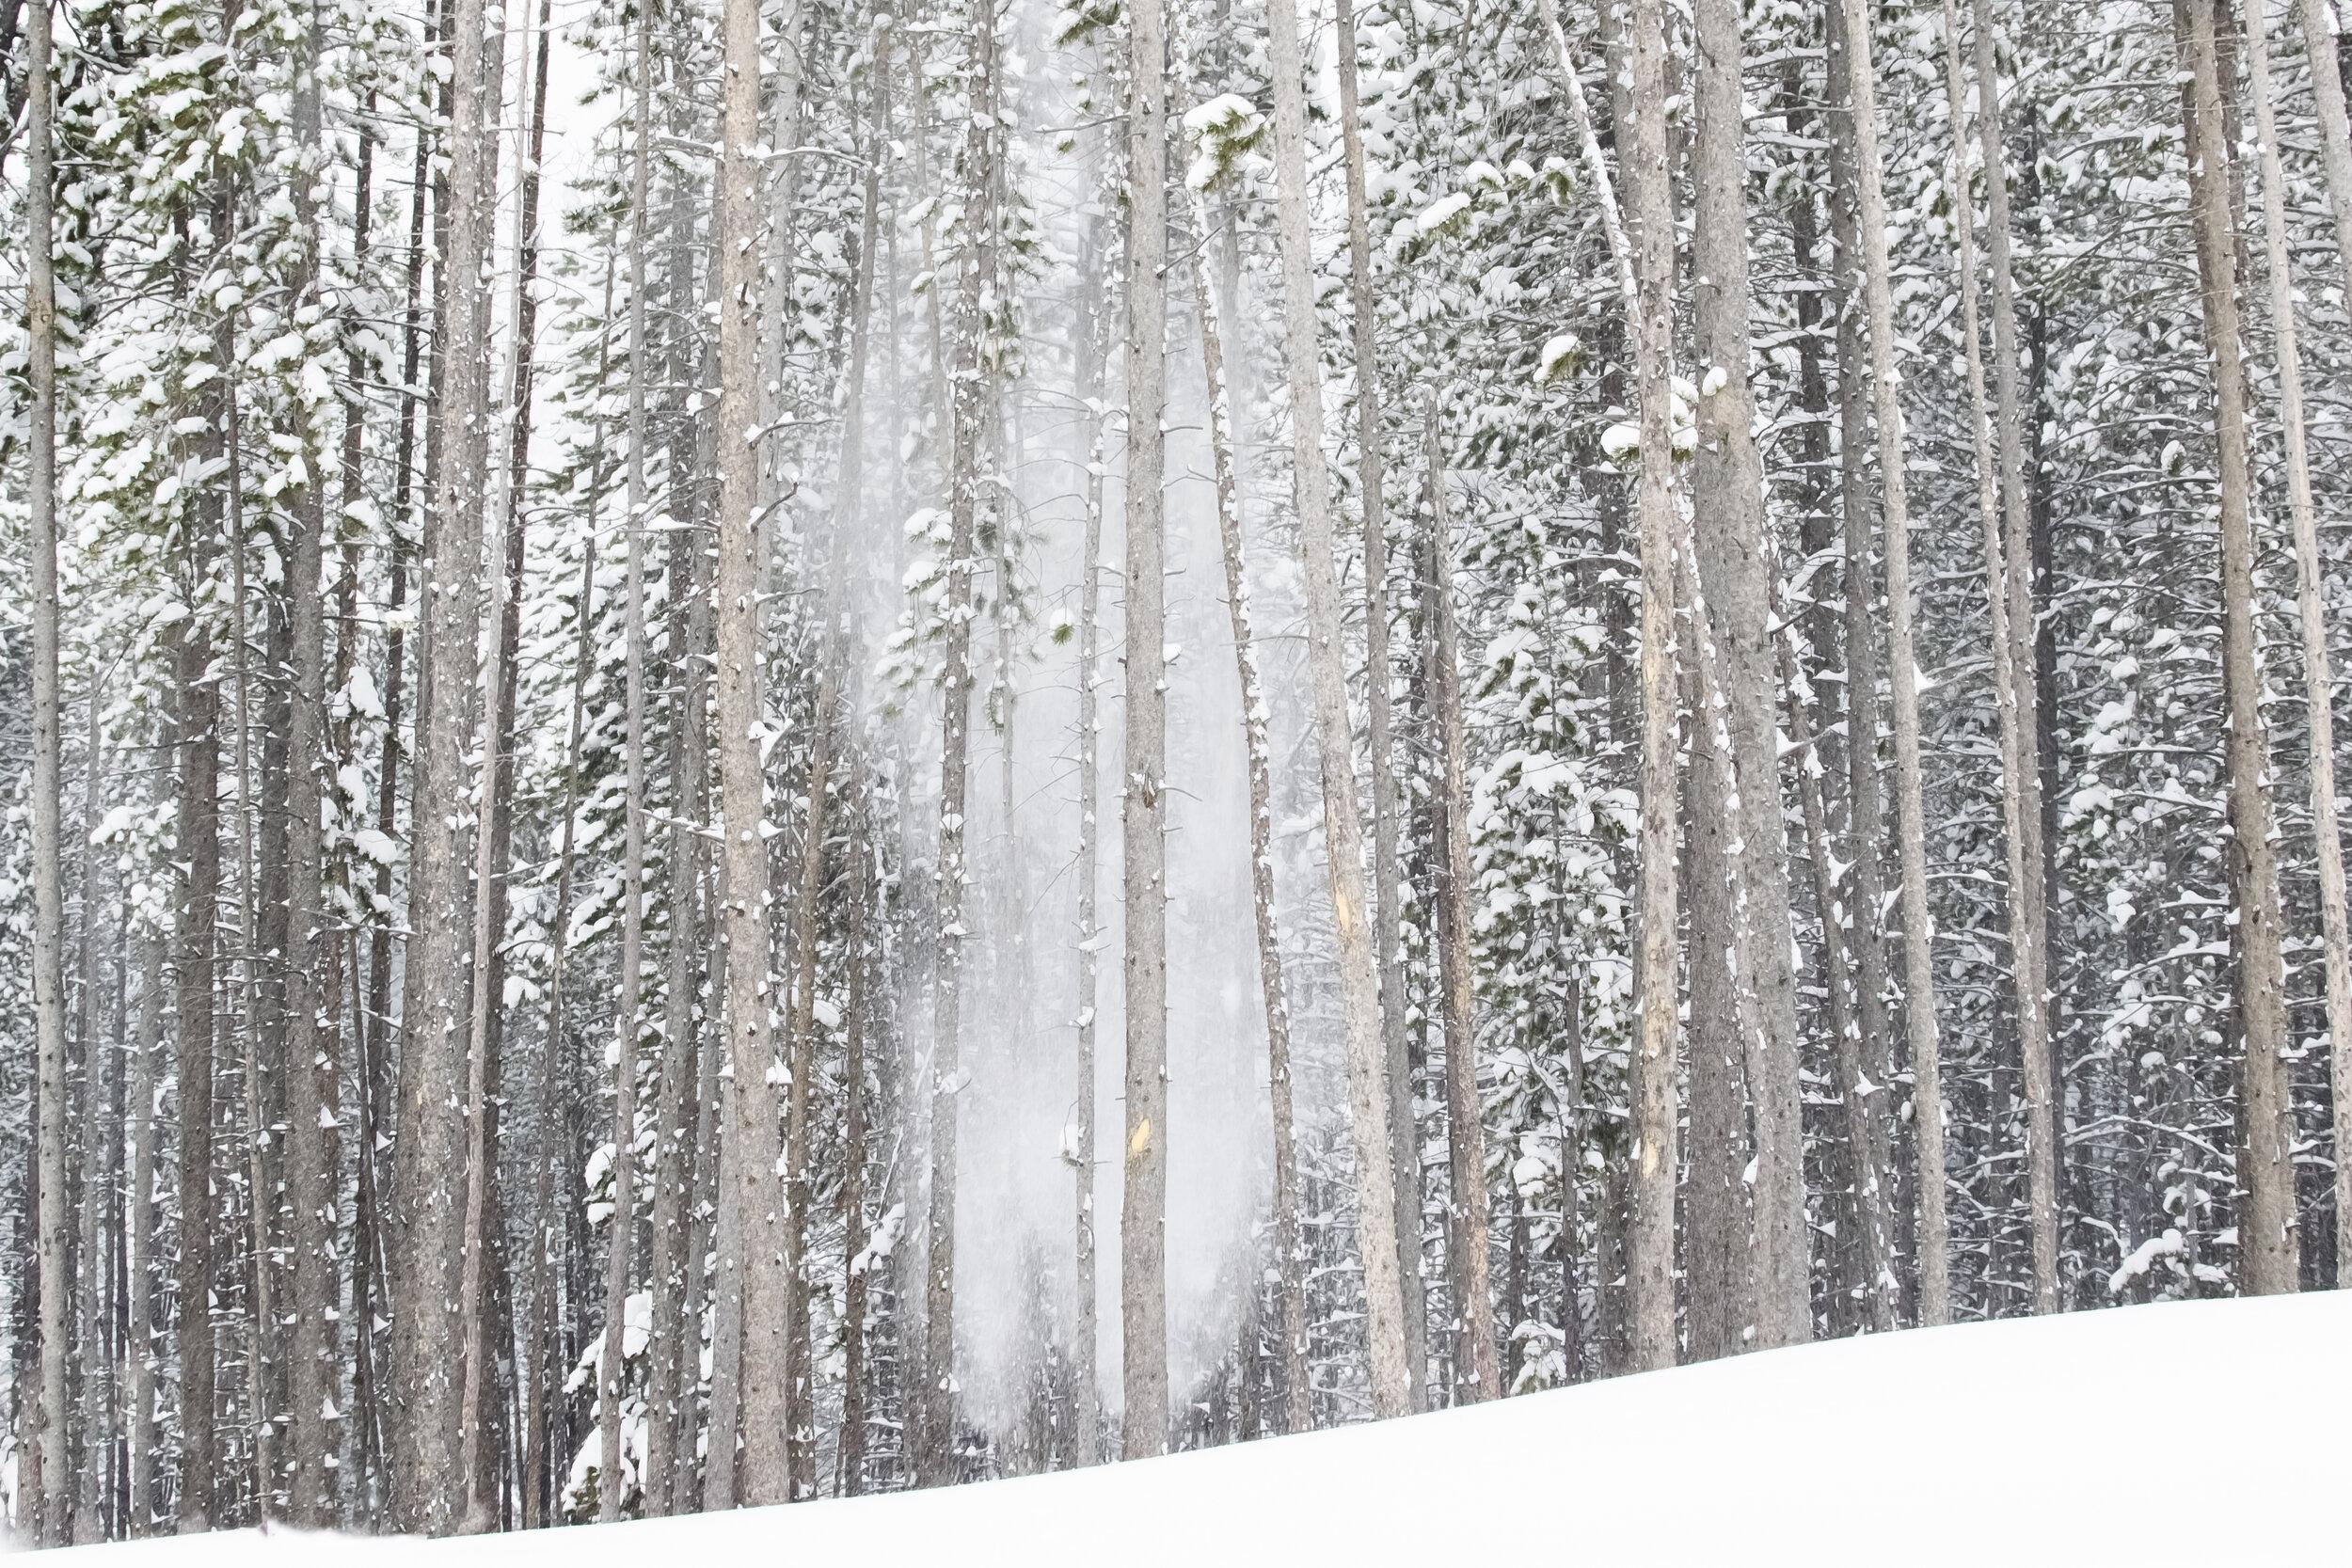 Snow_Falls_From_Trees-4543.jpg